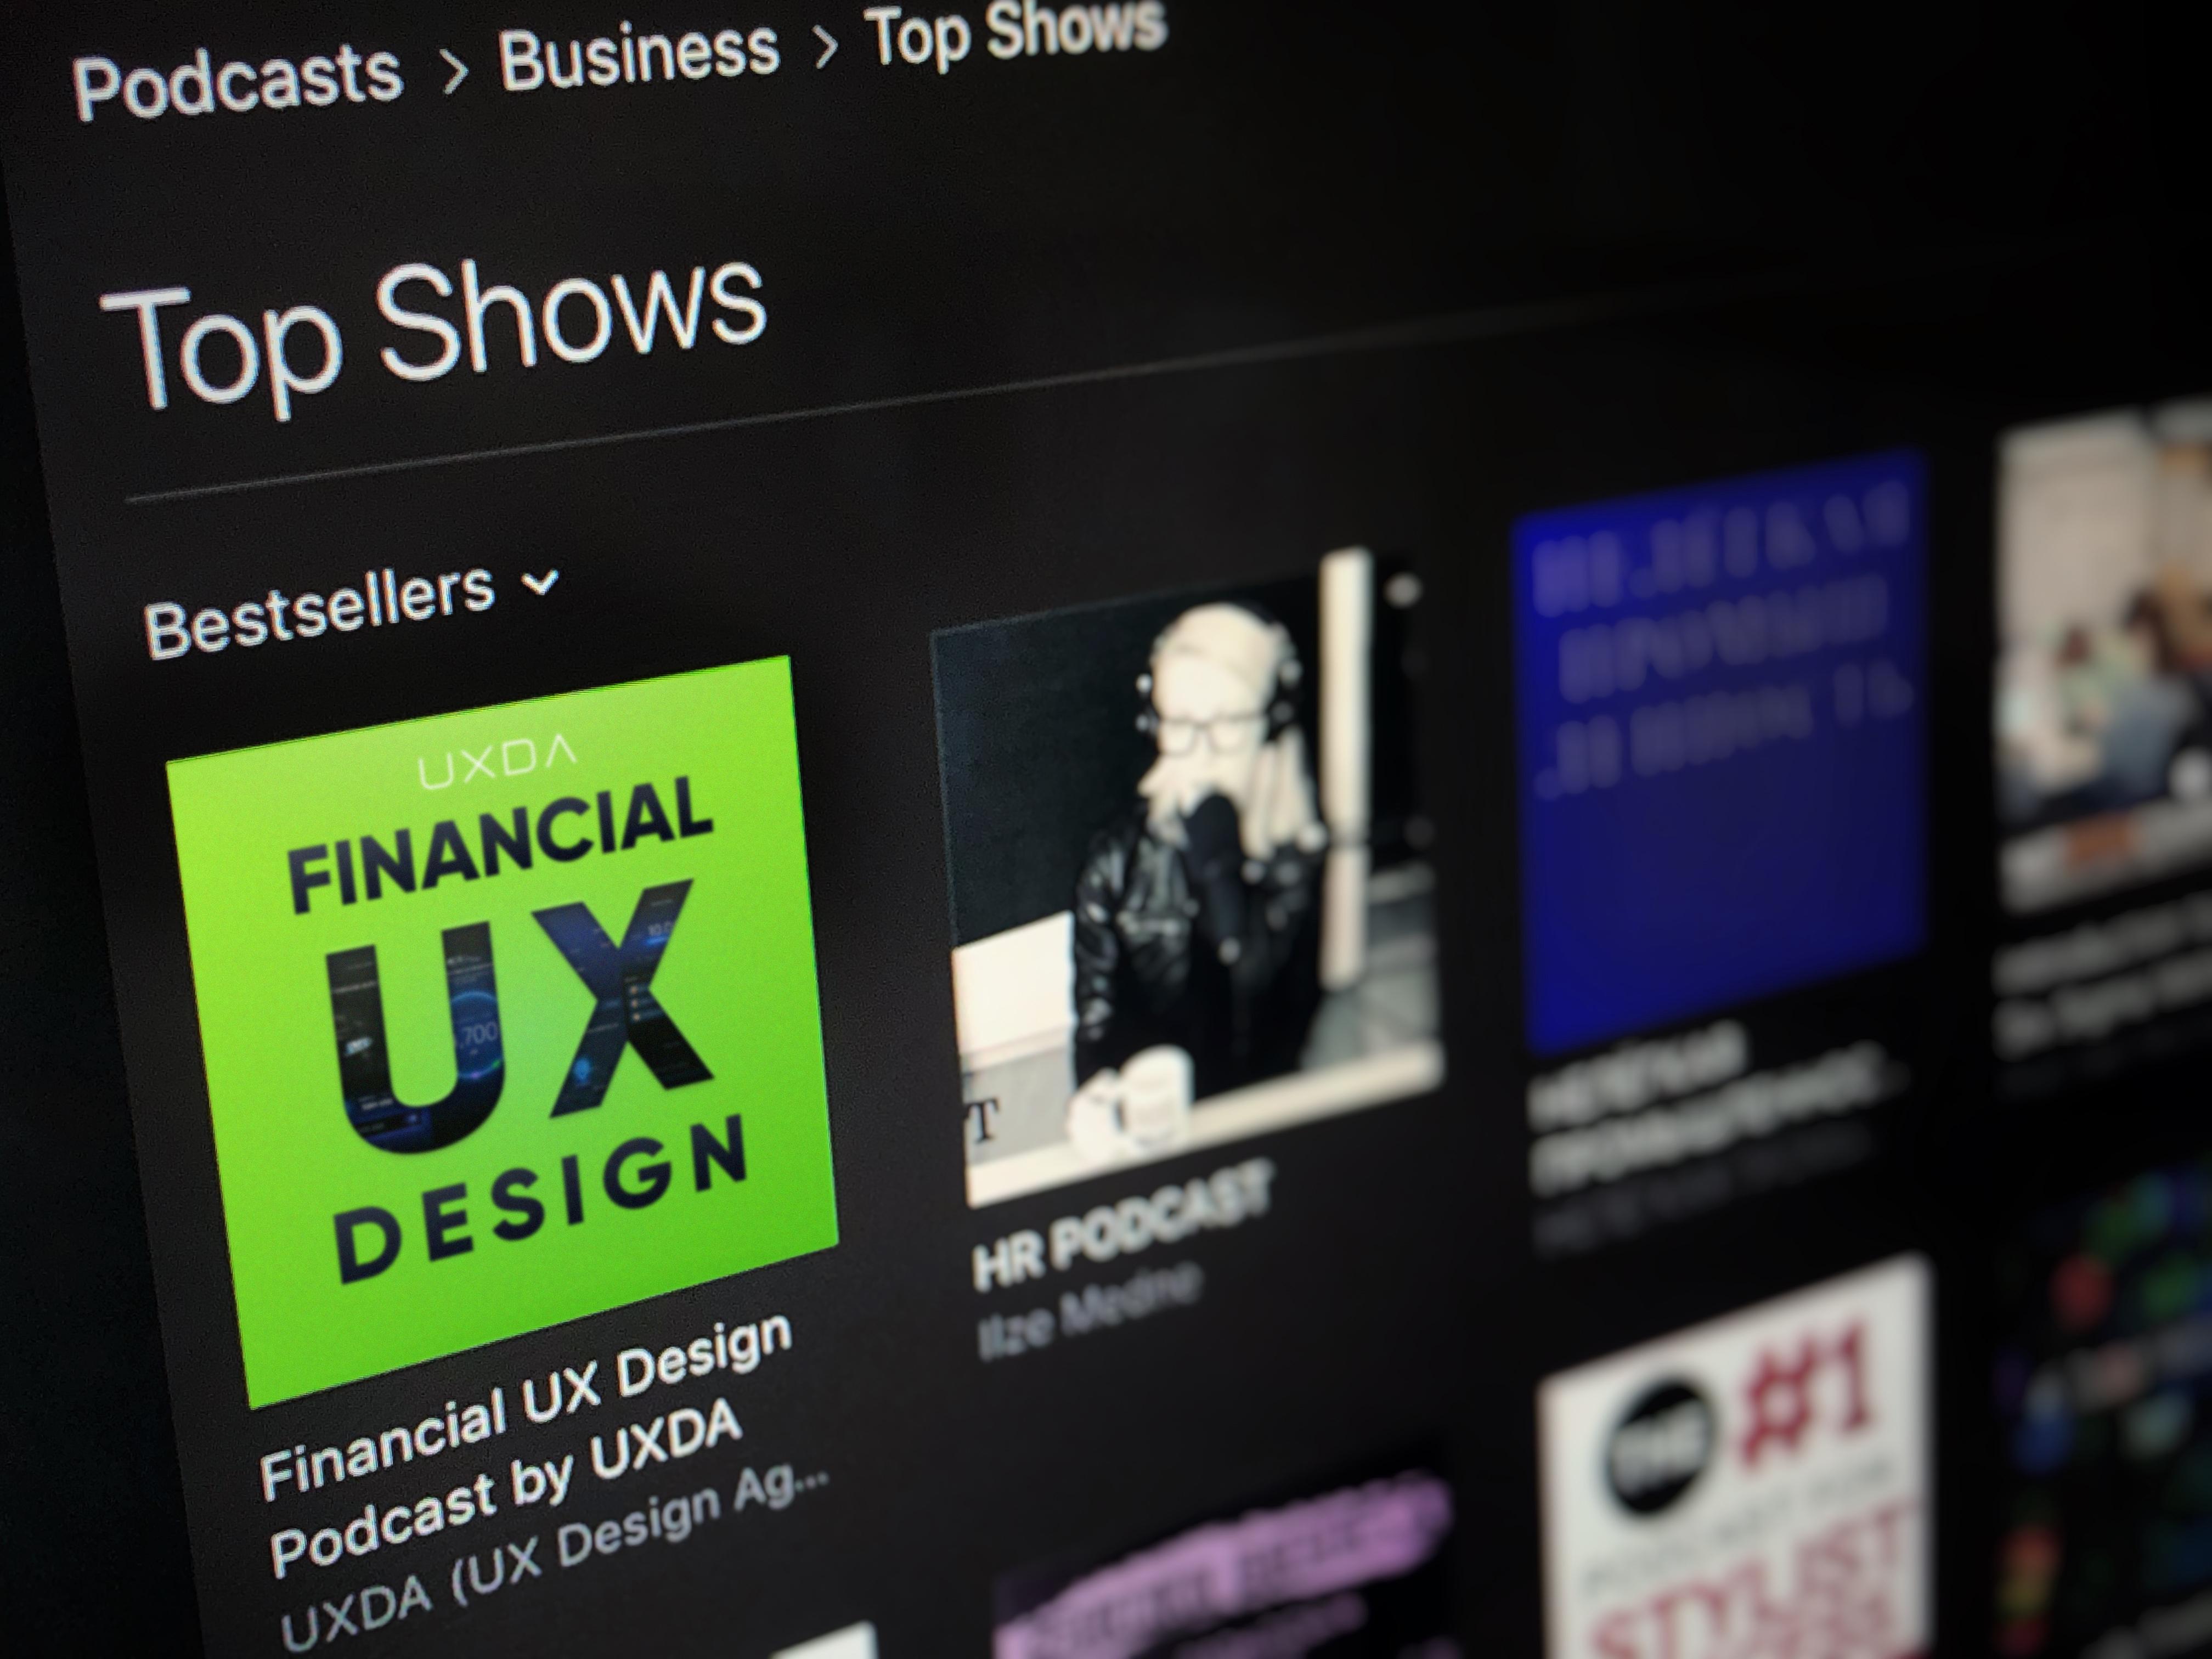 fiancial-ux-design-podcast-top.jpg